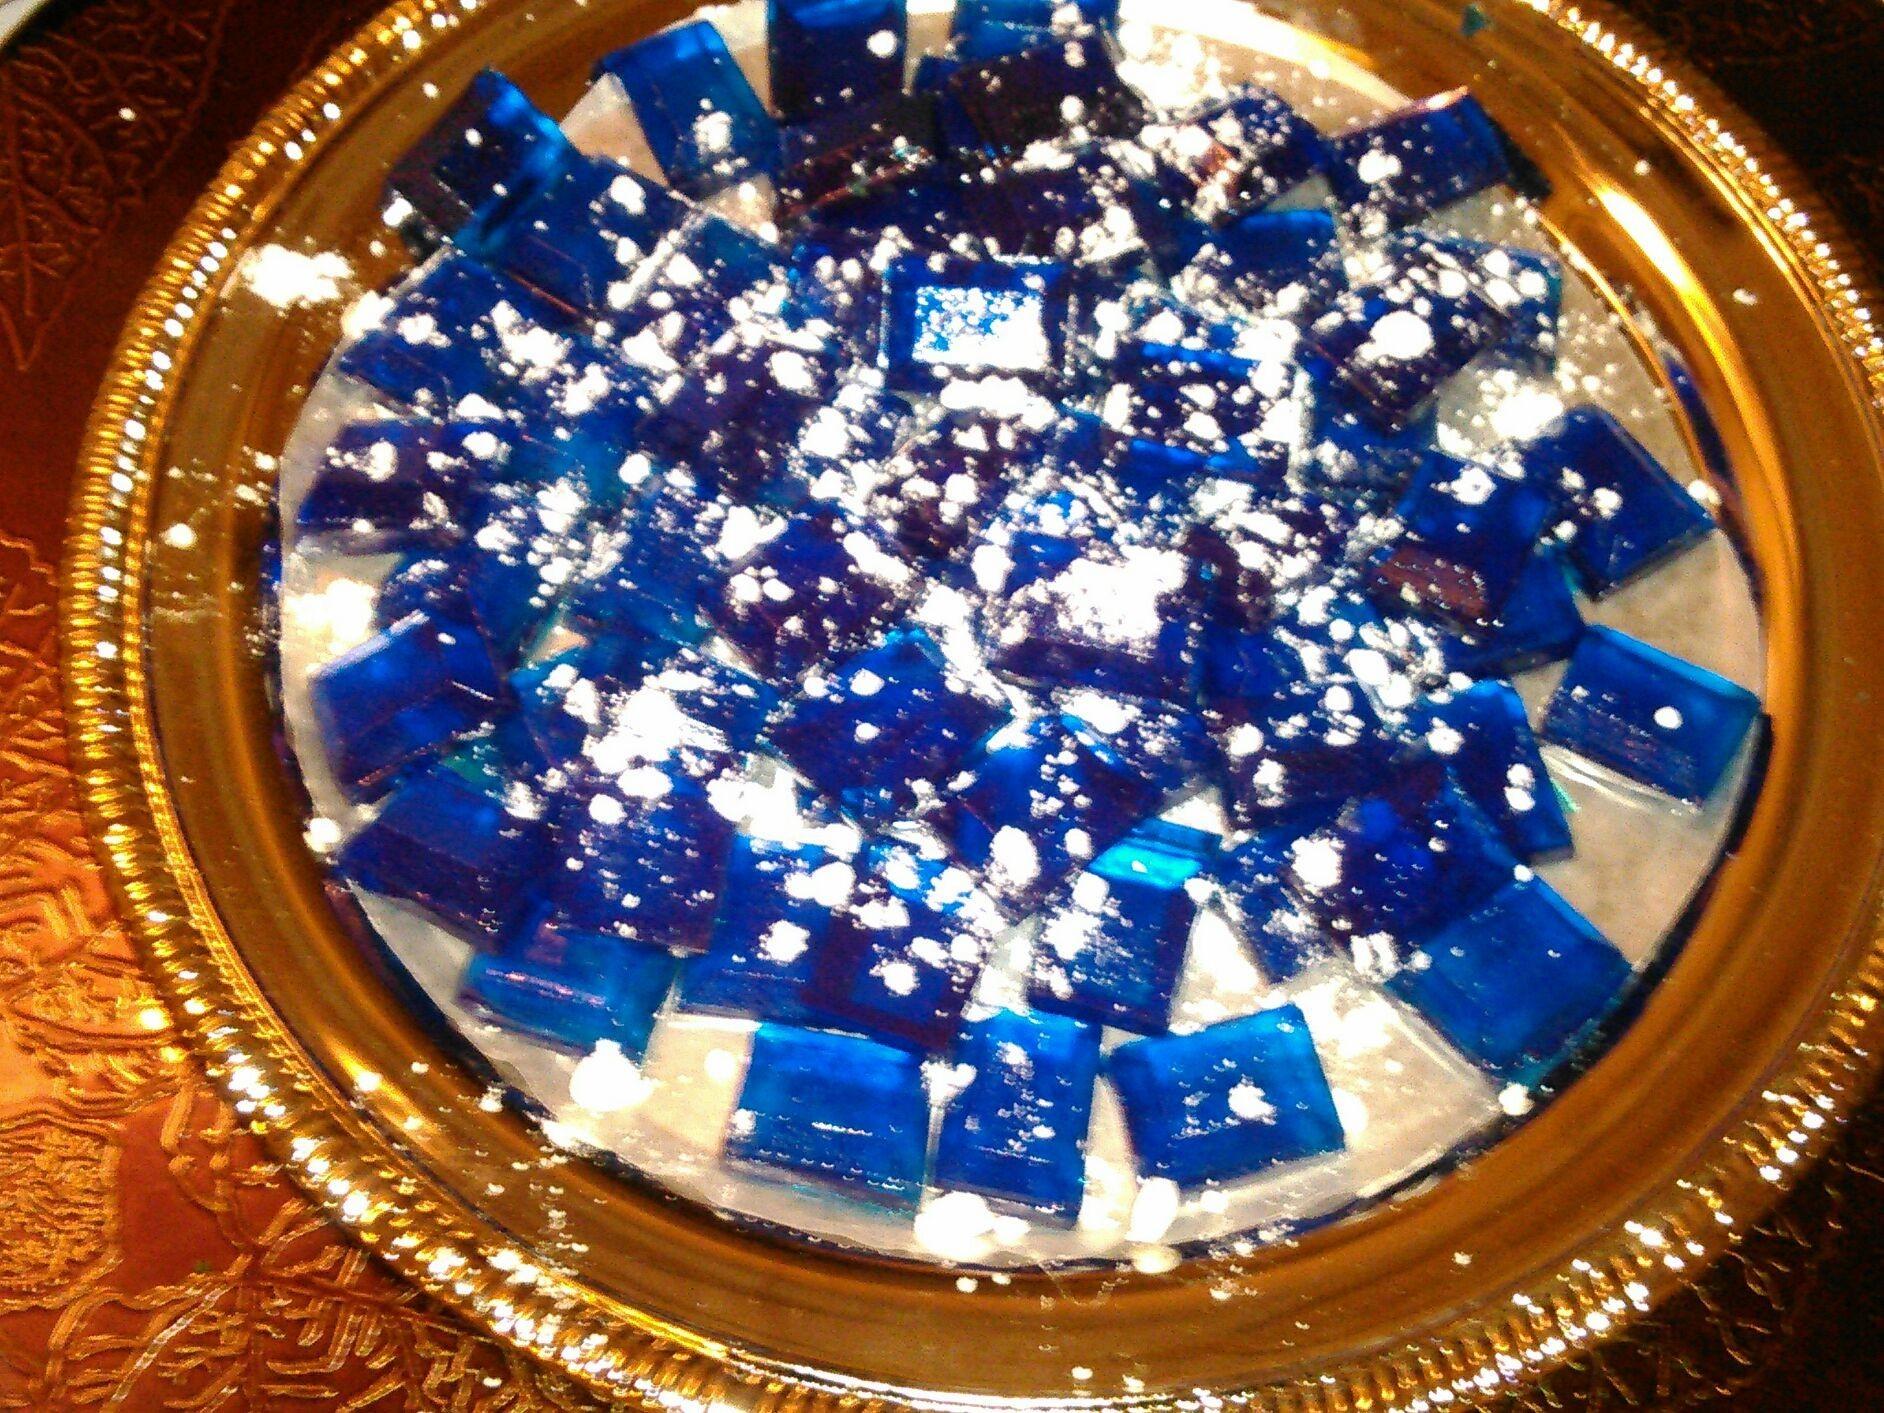 Sour blue raspberry #Cannaby from #OhanaMamasConfections! #legalizemarijuana #cannabisCuresCancer #stopwarondrugs #momsformarijuana #dadsformarijuana #parentsforpot #Dopesquad #Dabdivas #dabsociety #DOPE #smokethevote #Oregon